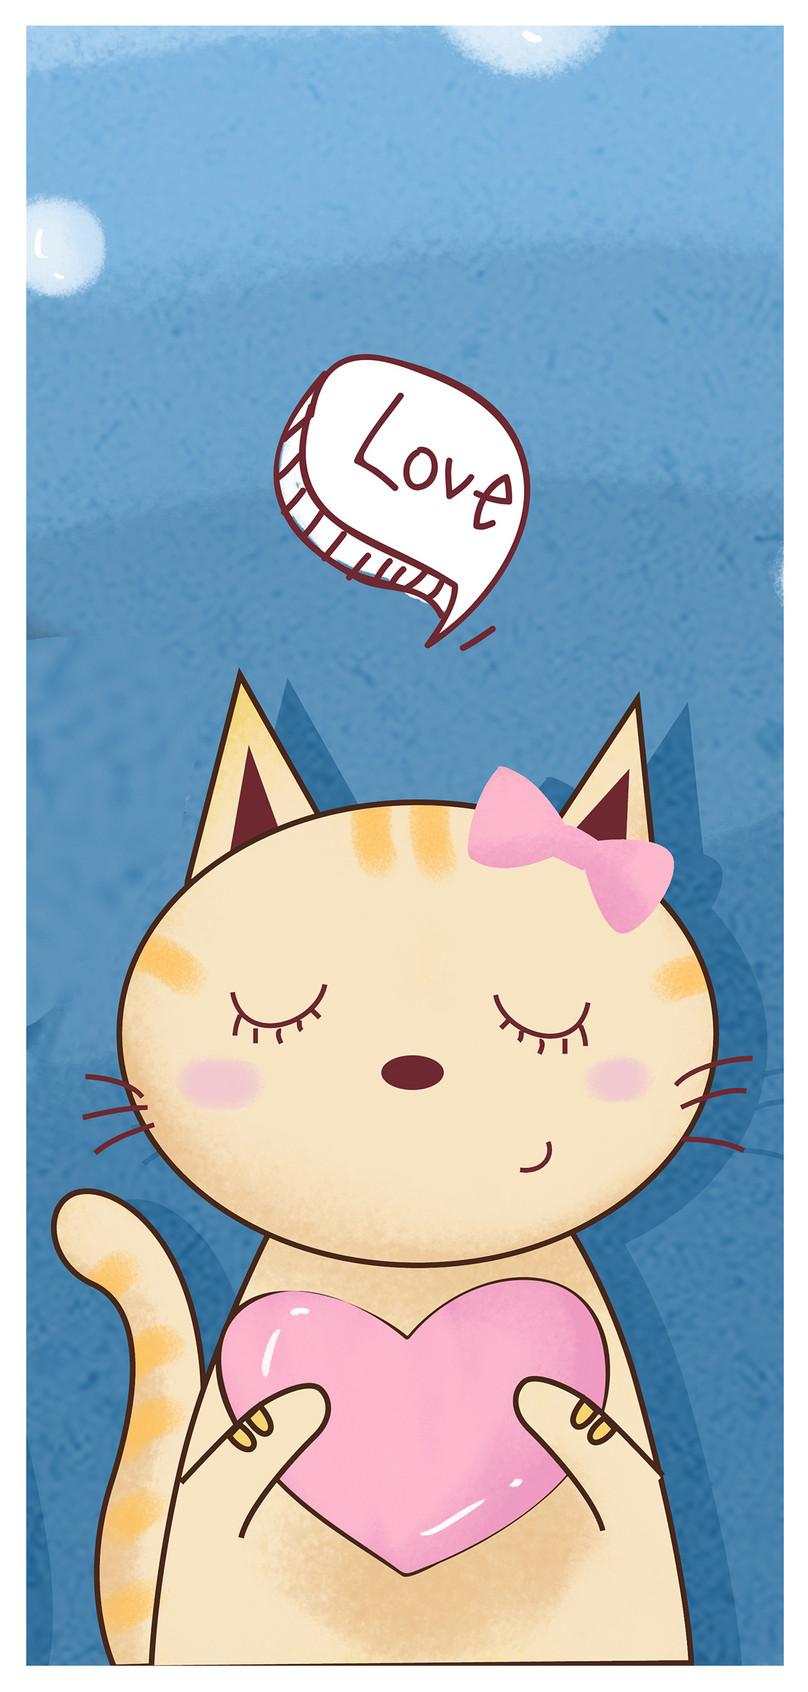 Wallpaper Ponsel Imut Yang Lucu - Cartoon - HD Wallpaper